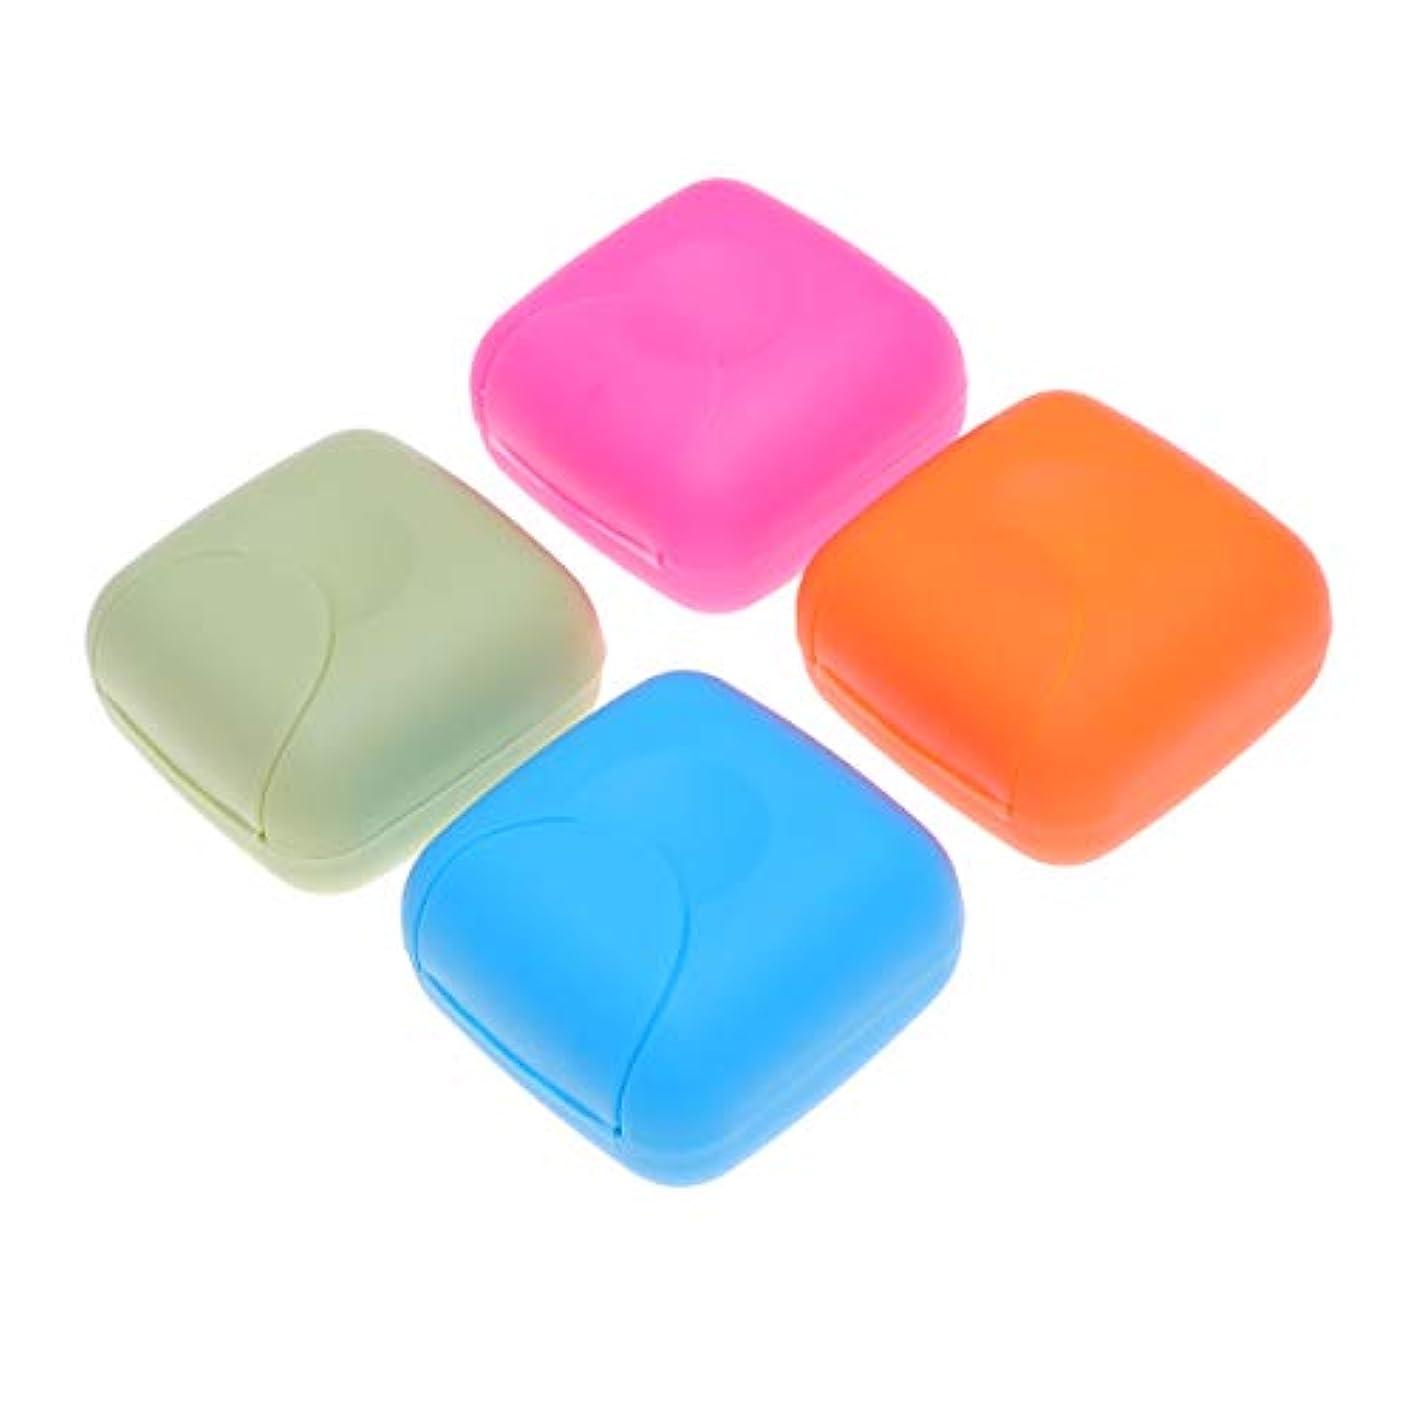 Healifty ソープボックスポータブルソープディッシュソープケース4本(ブルー、ロージー、オレンジ、ピンク)